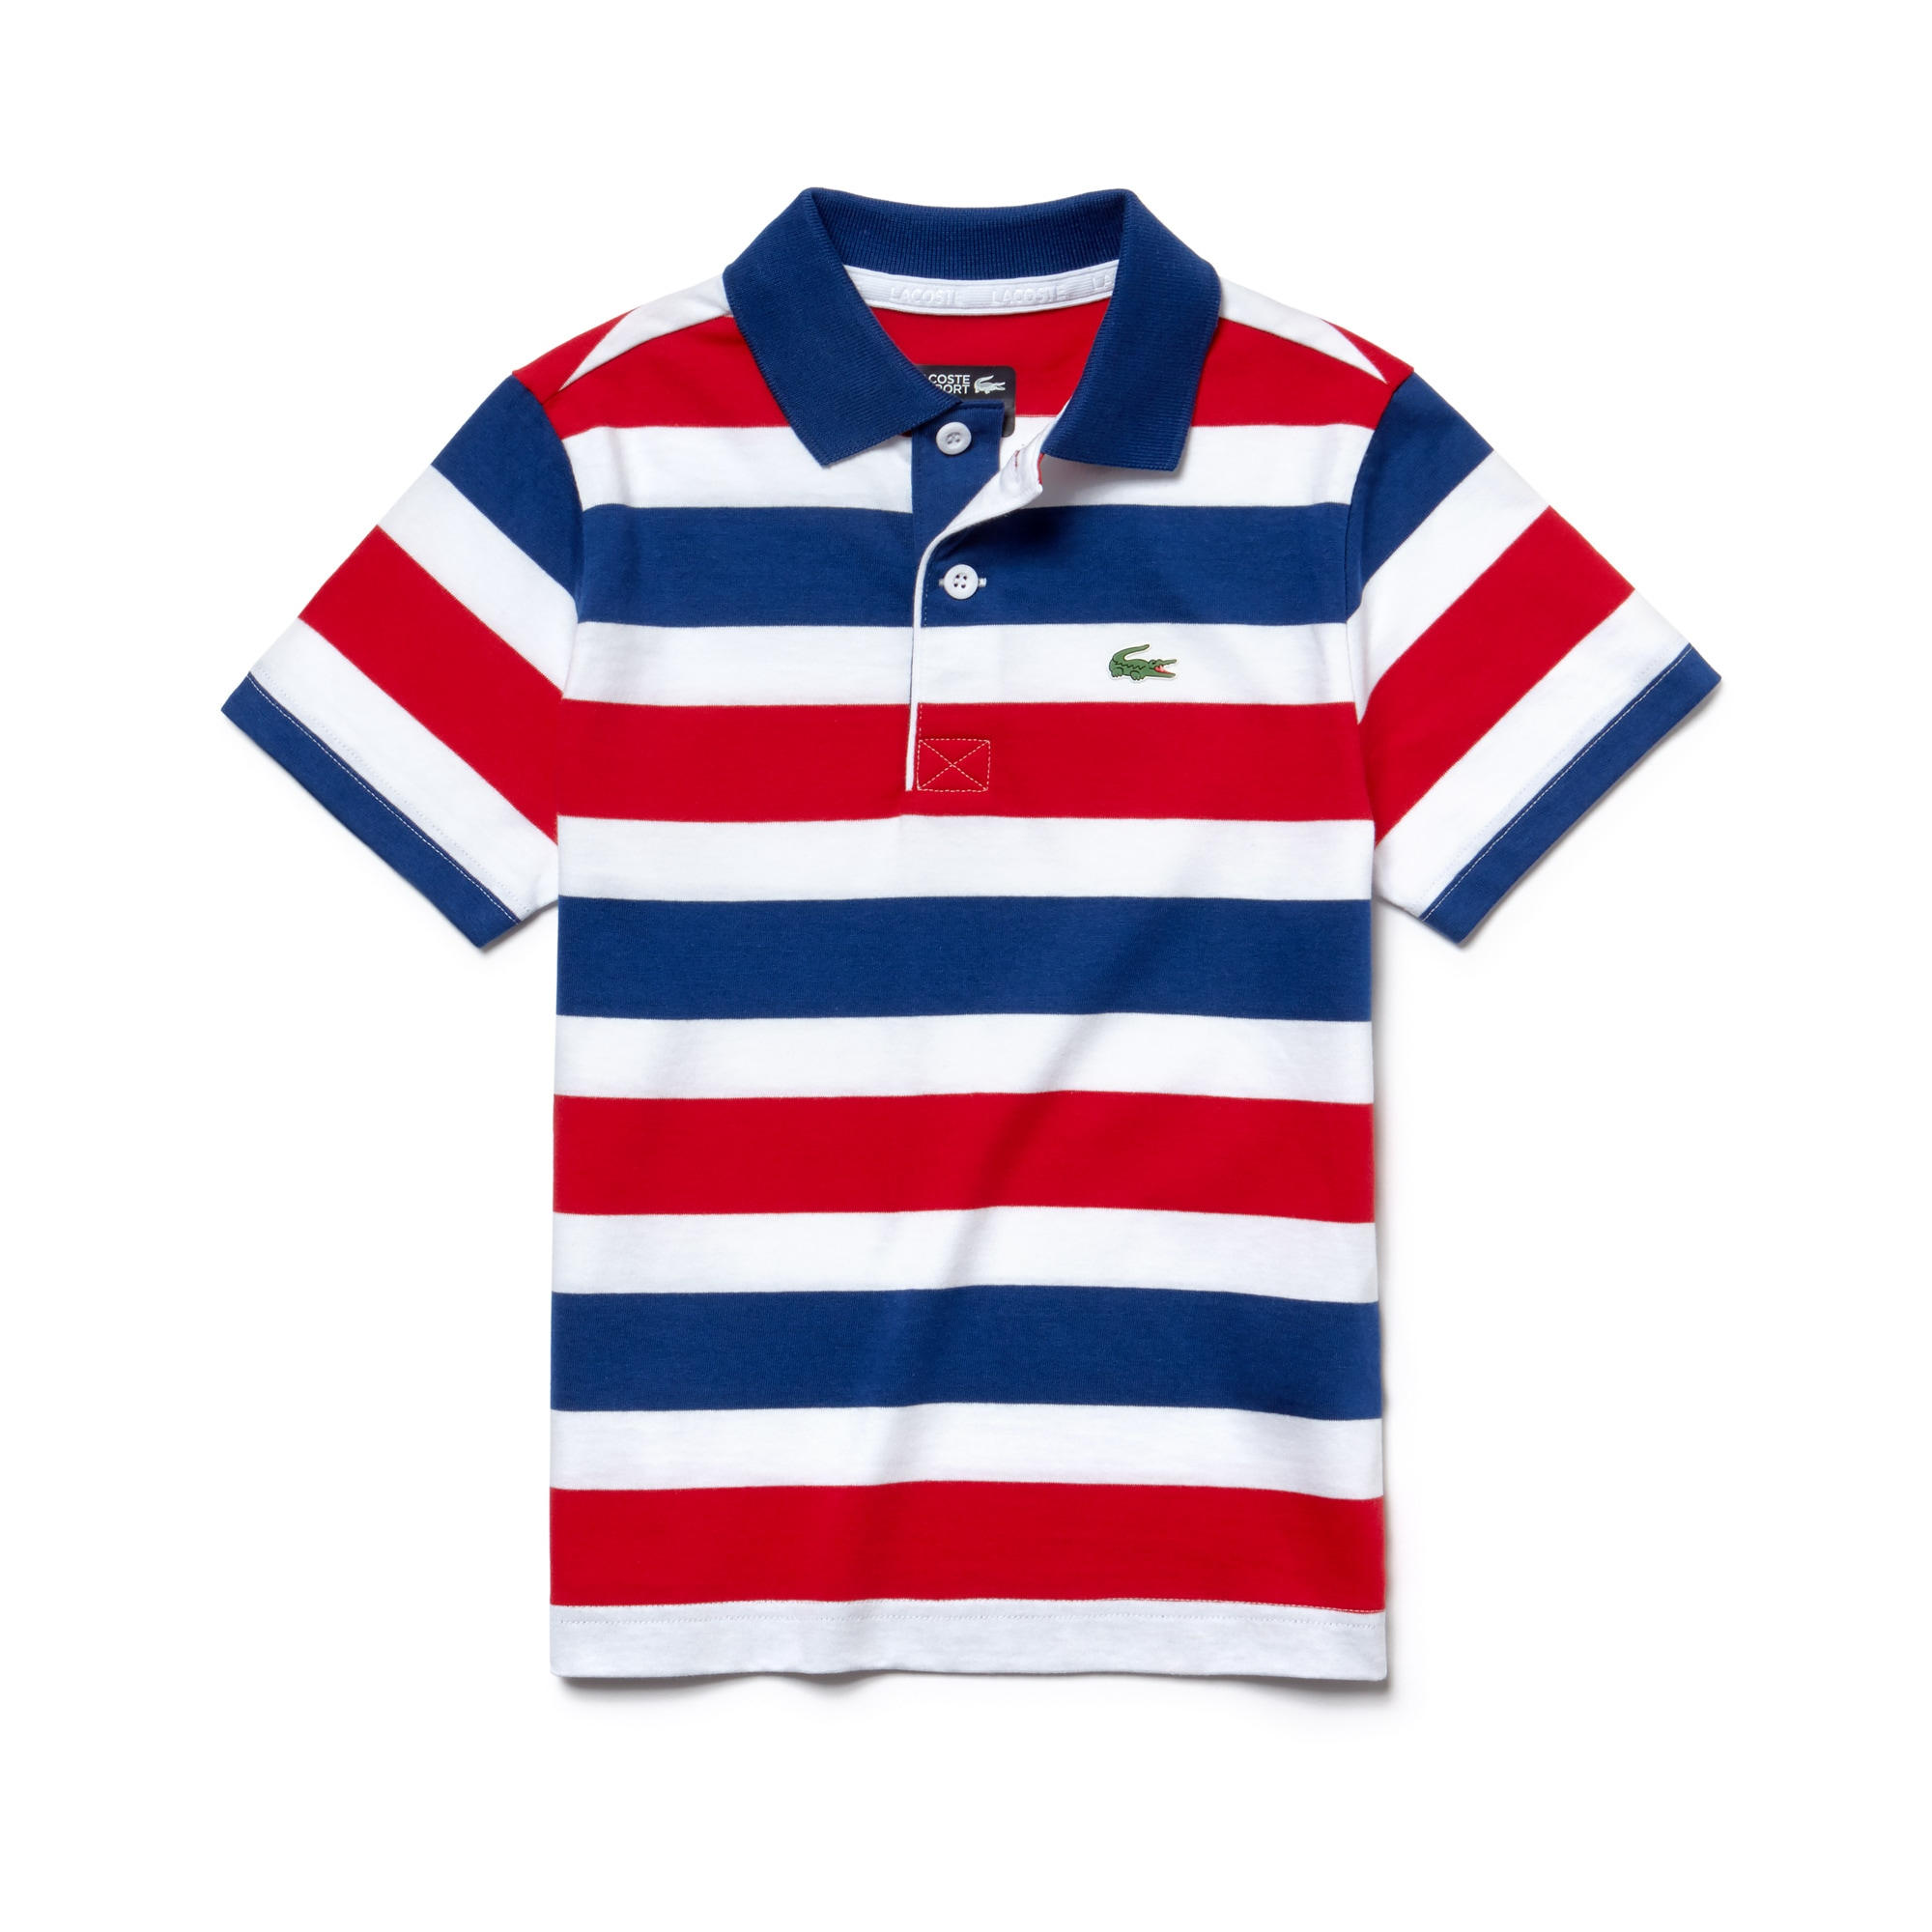 Boys' Lacoste SPORT Striped Cotton Jersey Tennis Polo